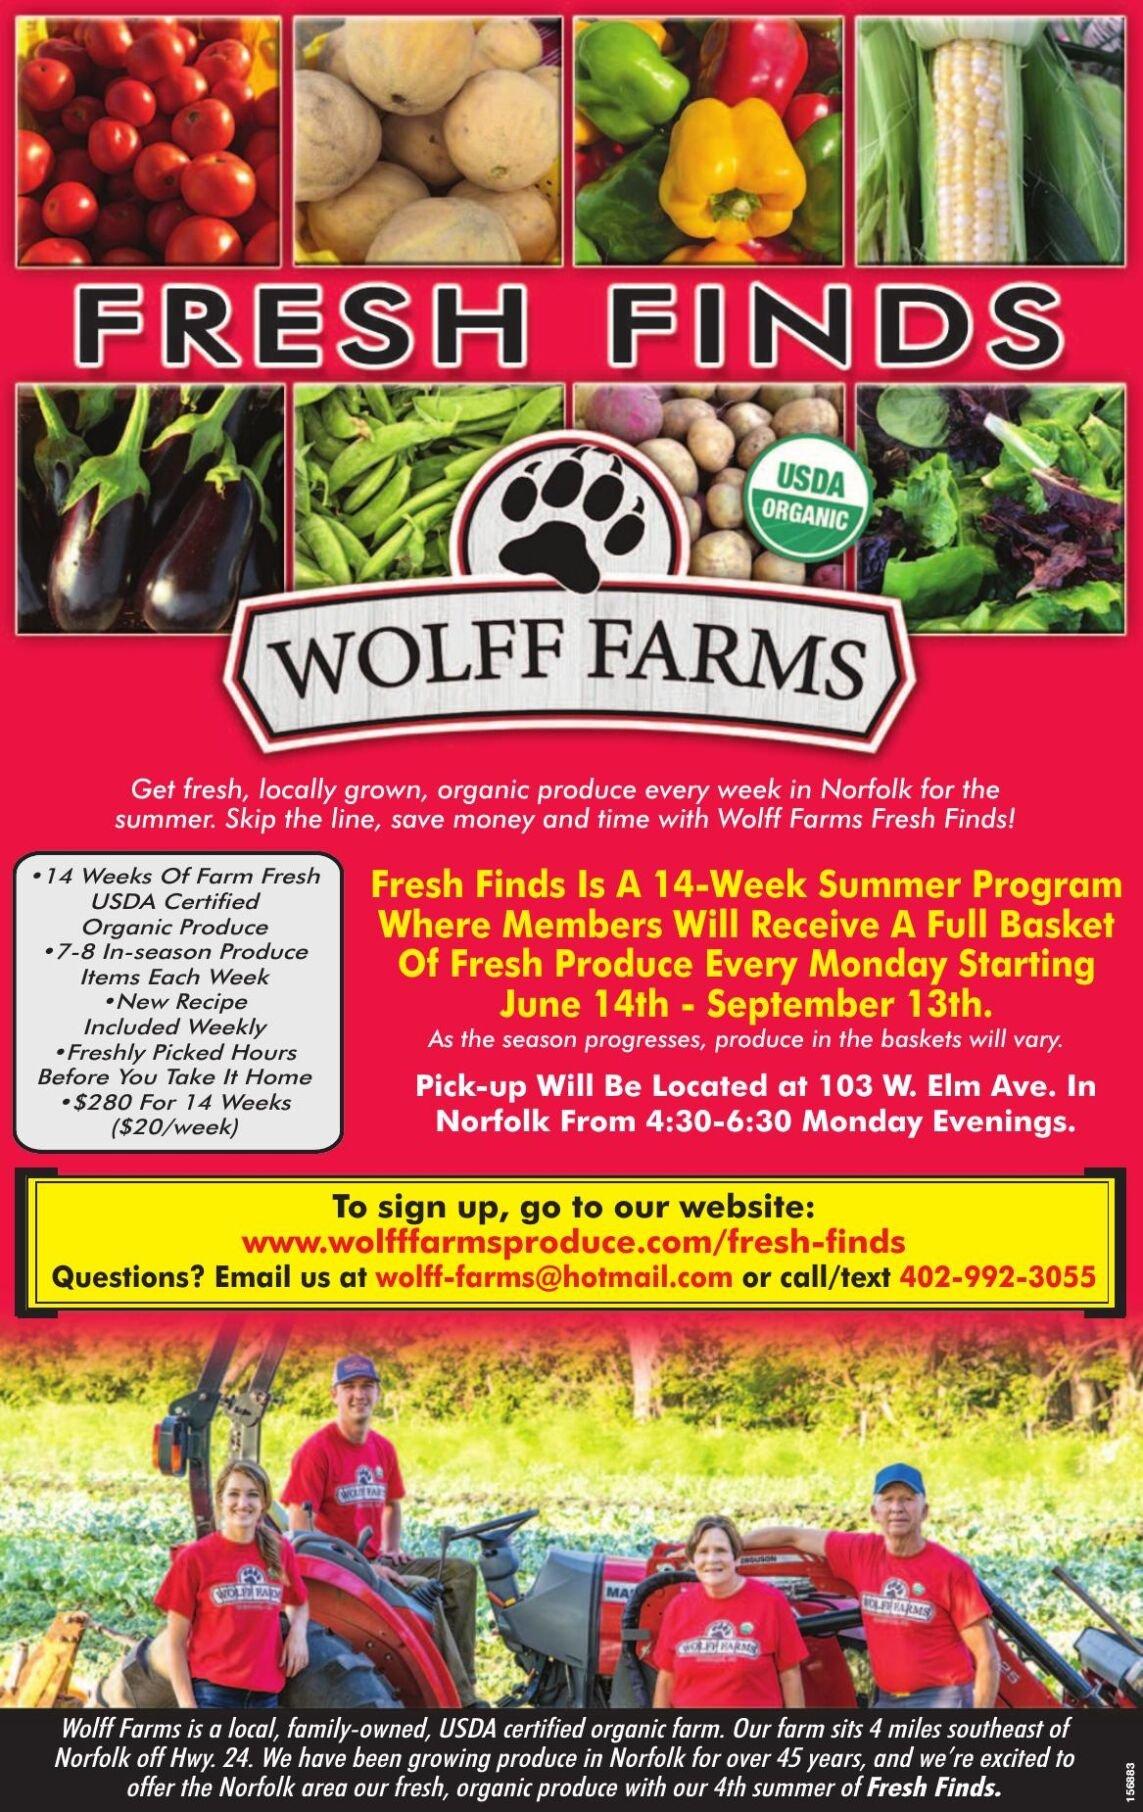 Wolff Farms